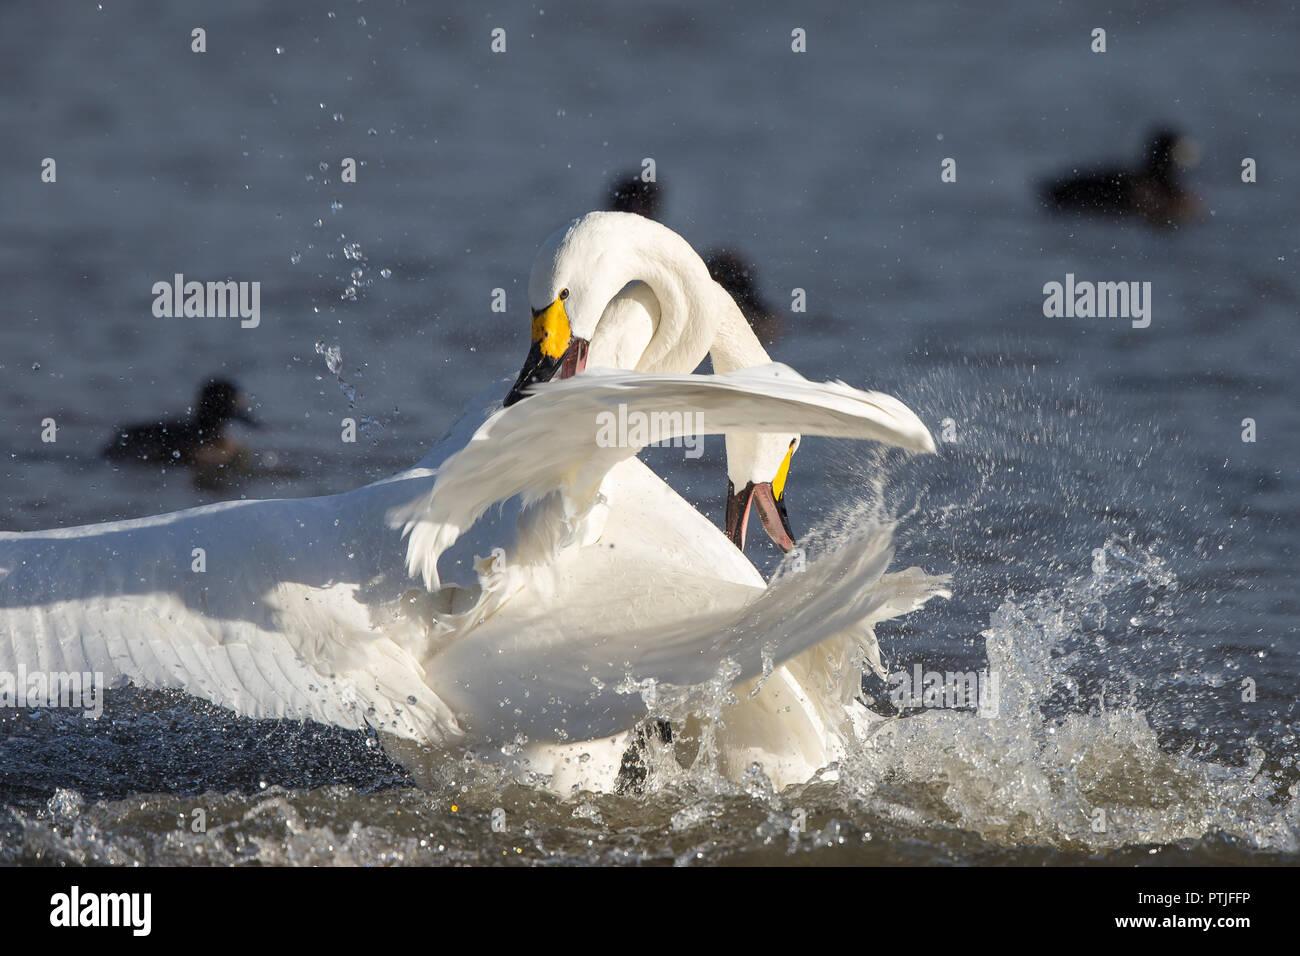 Dramatic action shot: two aggressive Bewick's swans (Cygnus columbianus) necks entangled, wings raised, splashing in fierce water battle in winter sun. Stock Photo